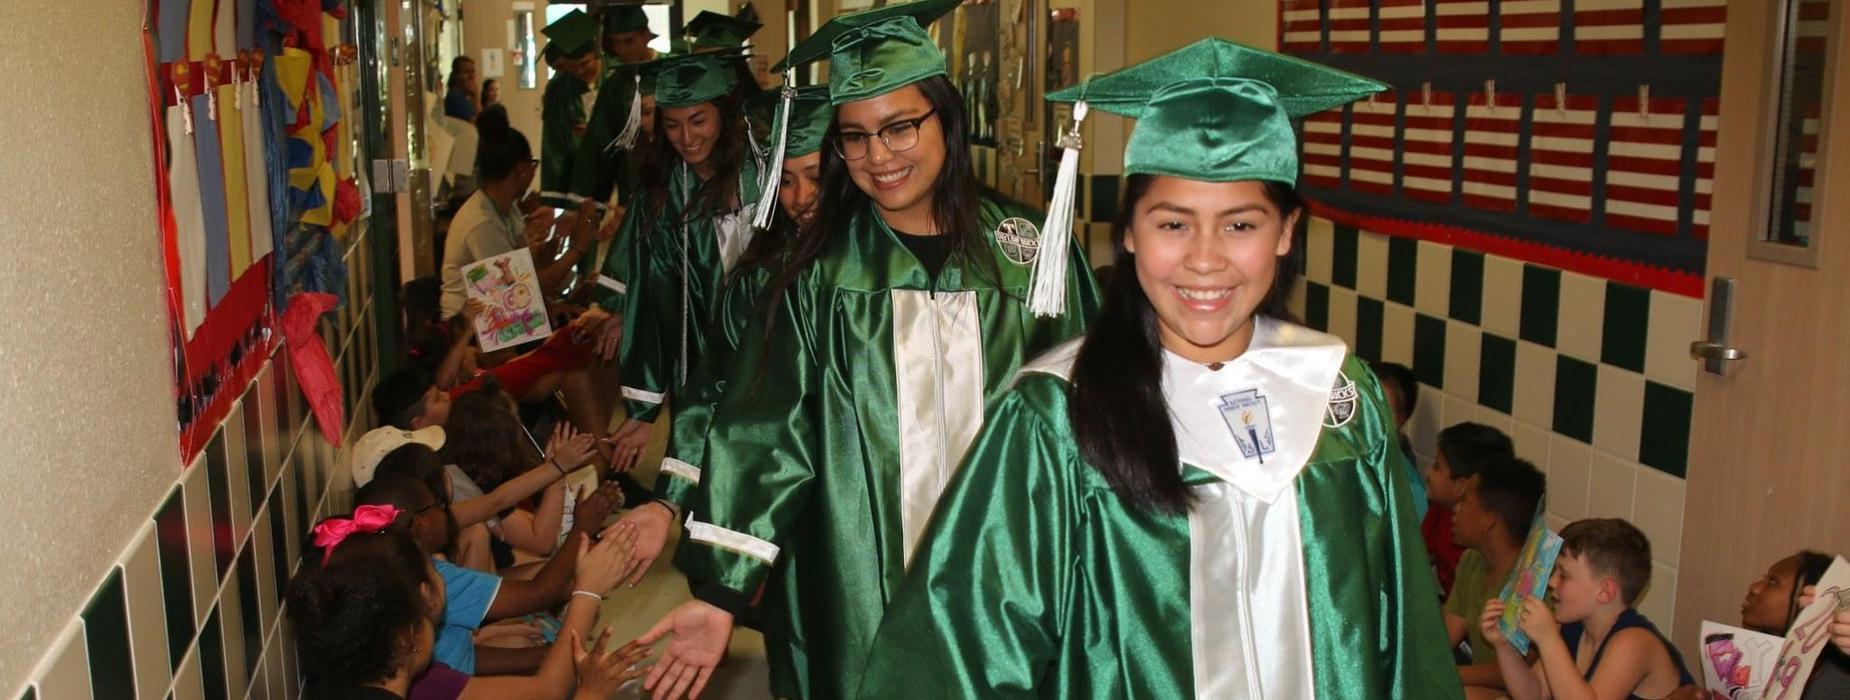 Current Grads visit future grads